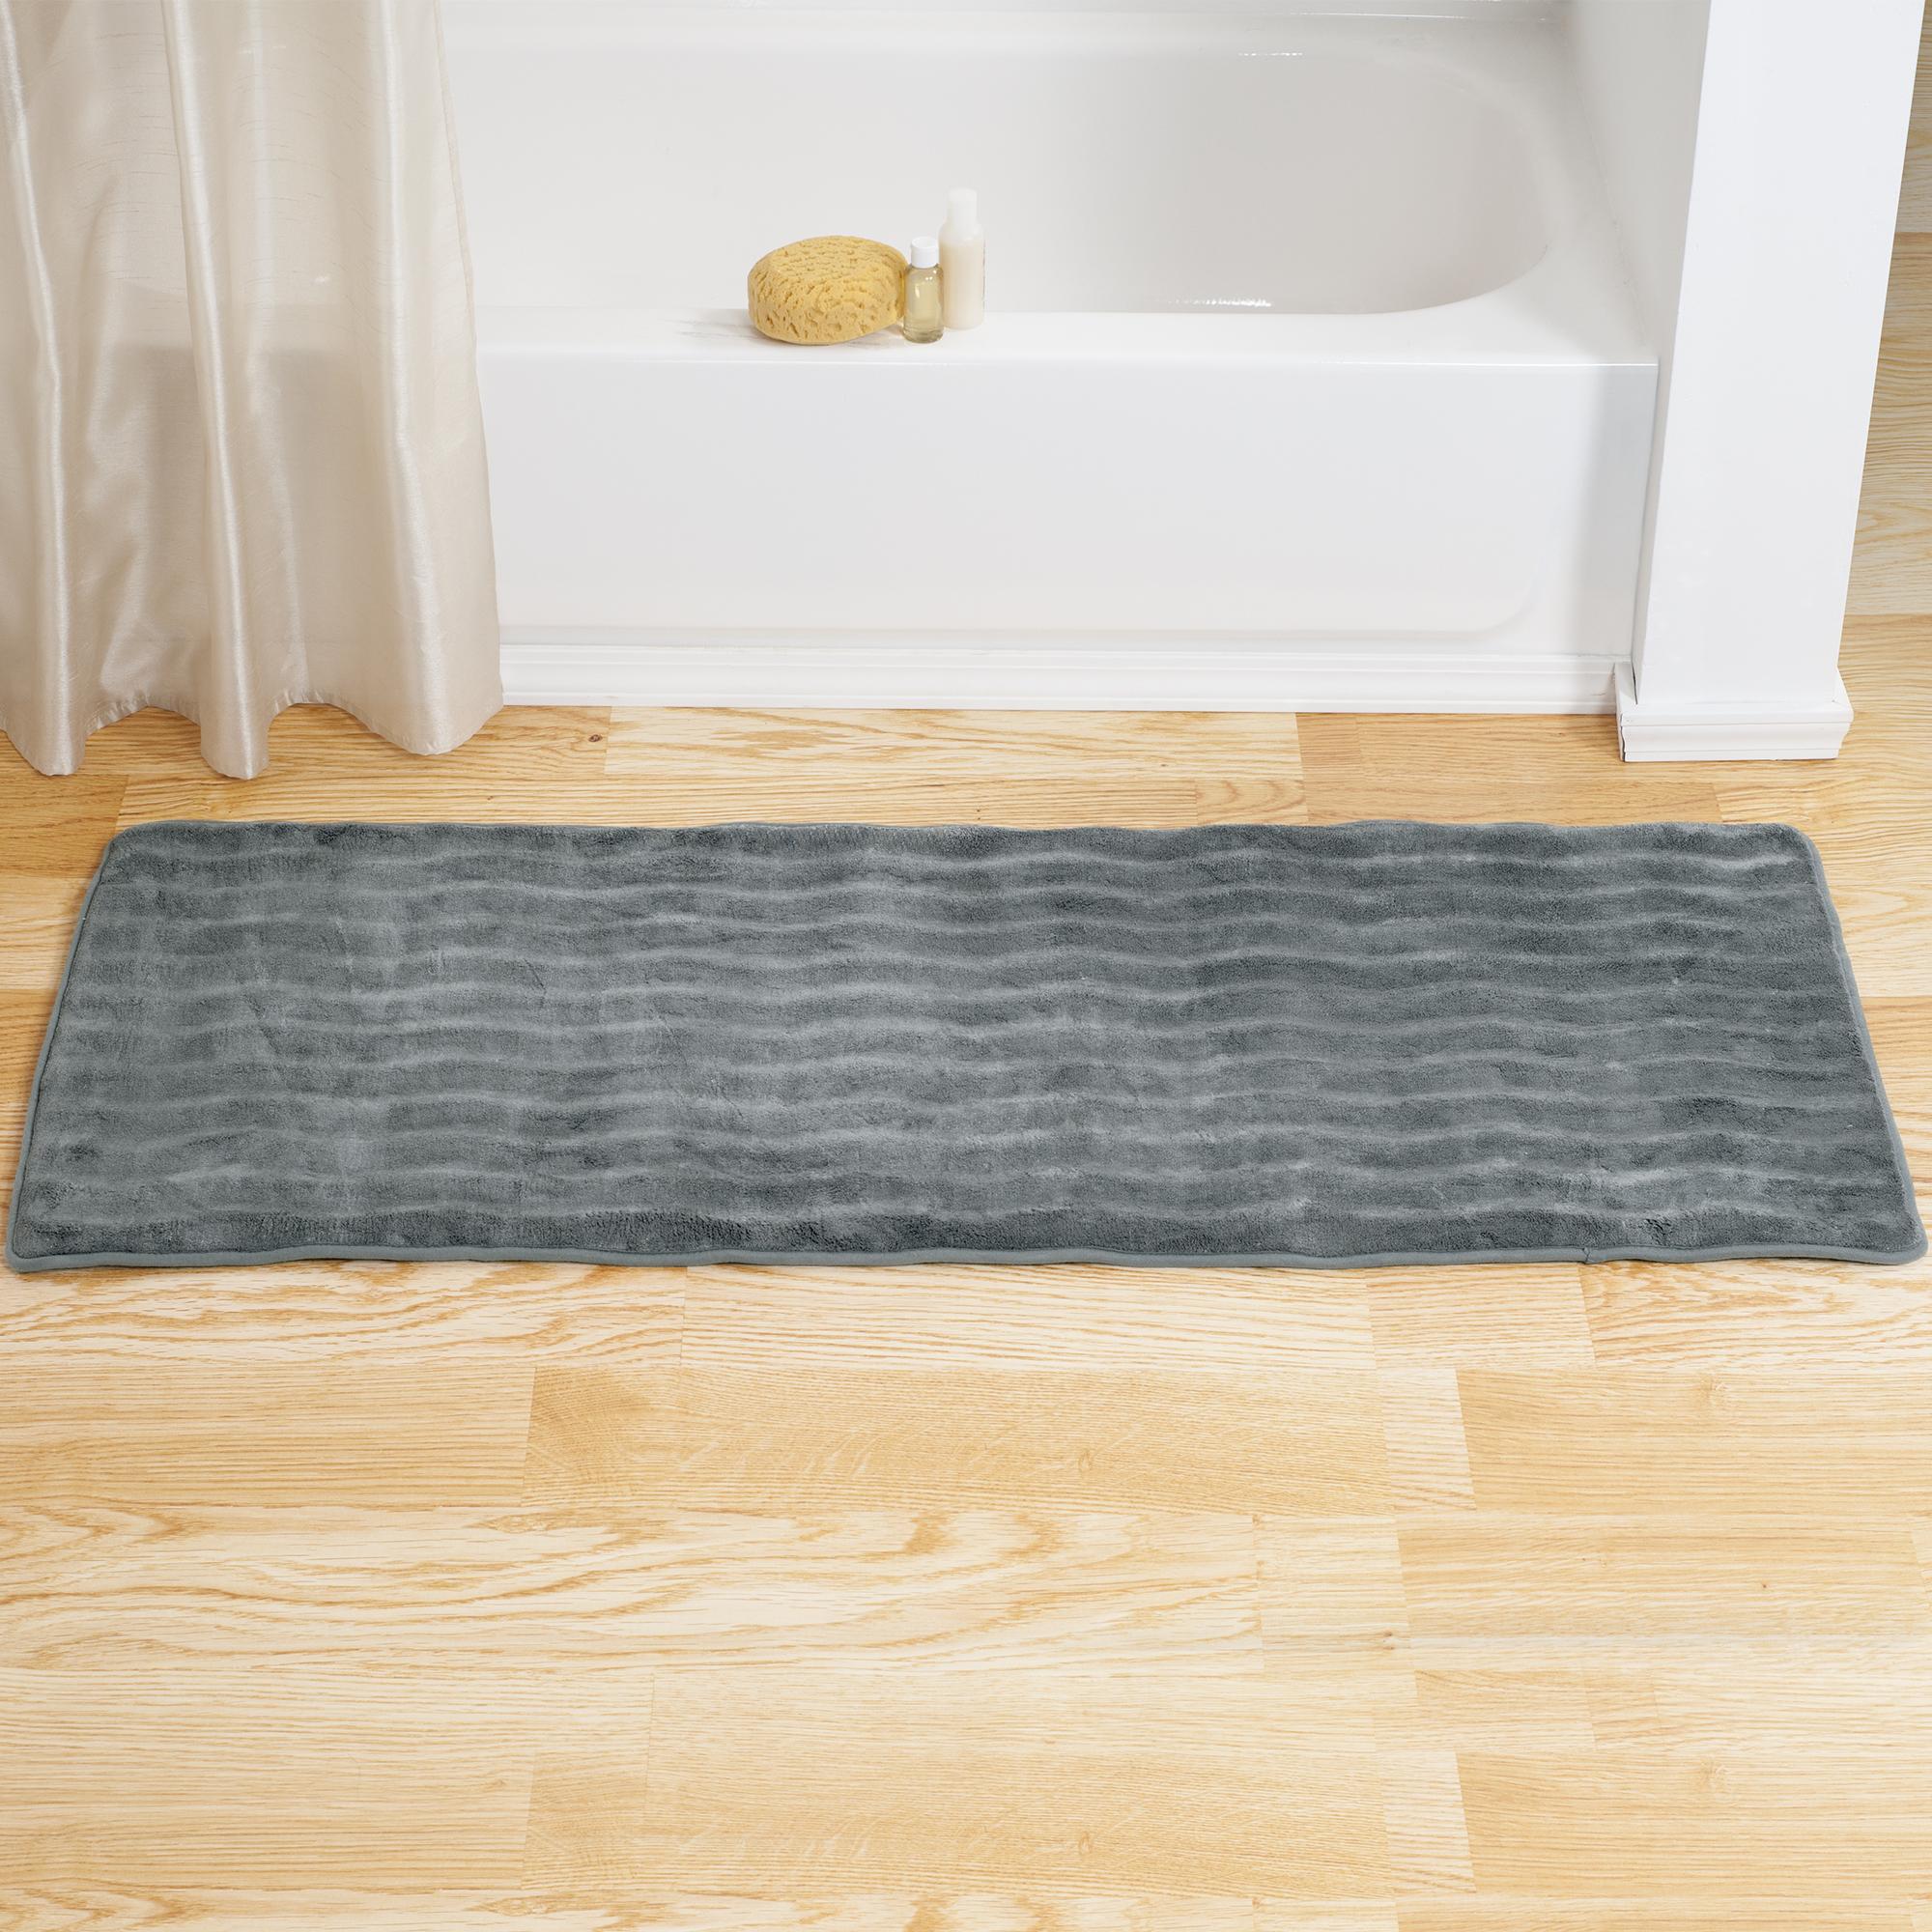 Lavish Home Memory Foam Extra Long Bath Rug Mat - Platinum - 24x60